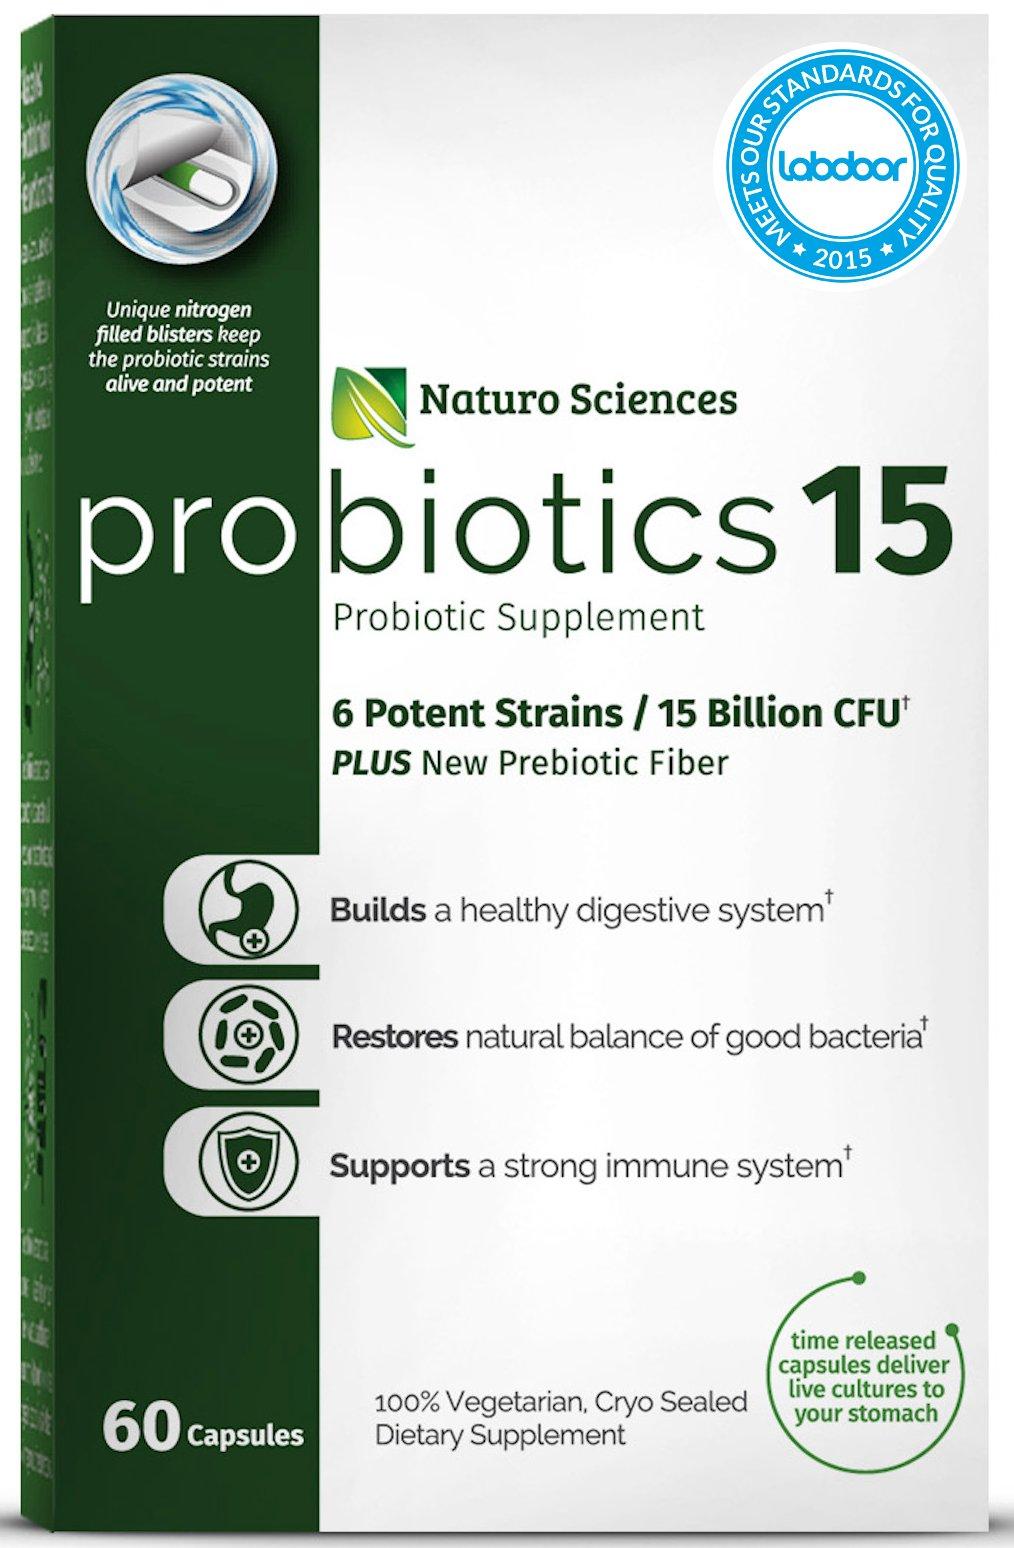 Naturo Sciences Probiotics 15 Billion CFU, Advanced Probiotic Supplement, Time Released Capsules in Dry Nitrogen Filled Blister Packs, 60 Servings, 1 a Day Servings by Naturo Sciences (Image #6)